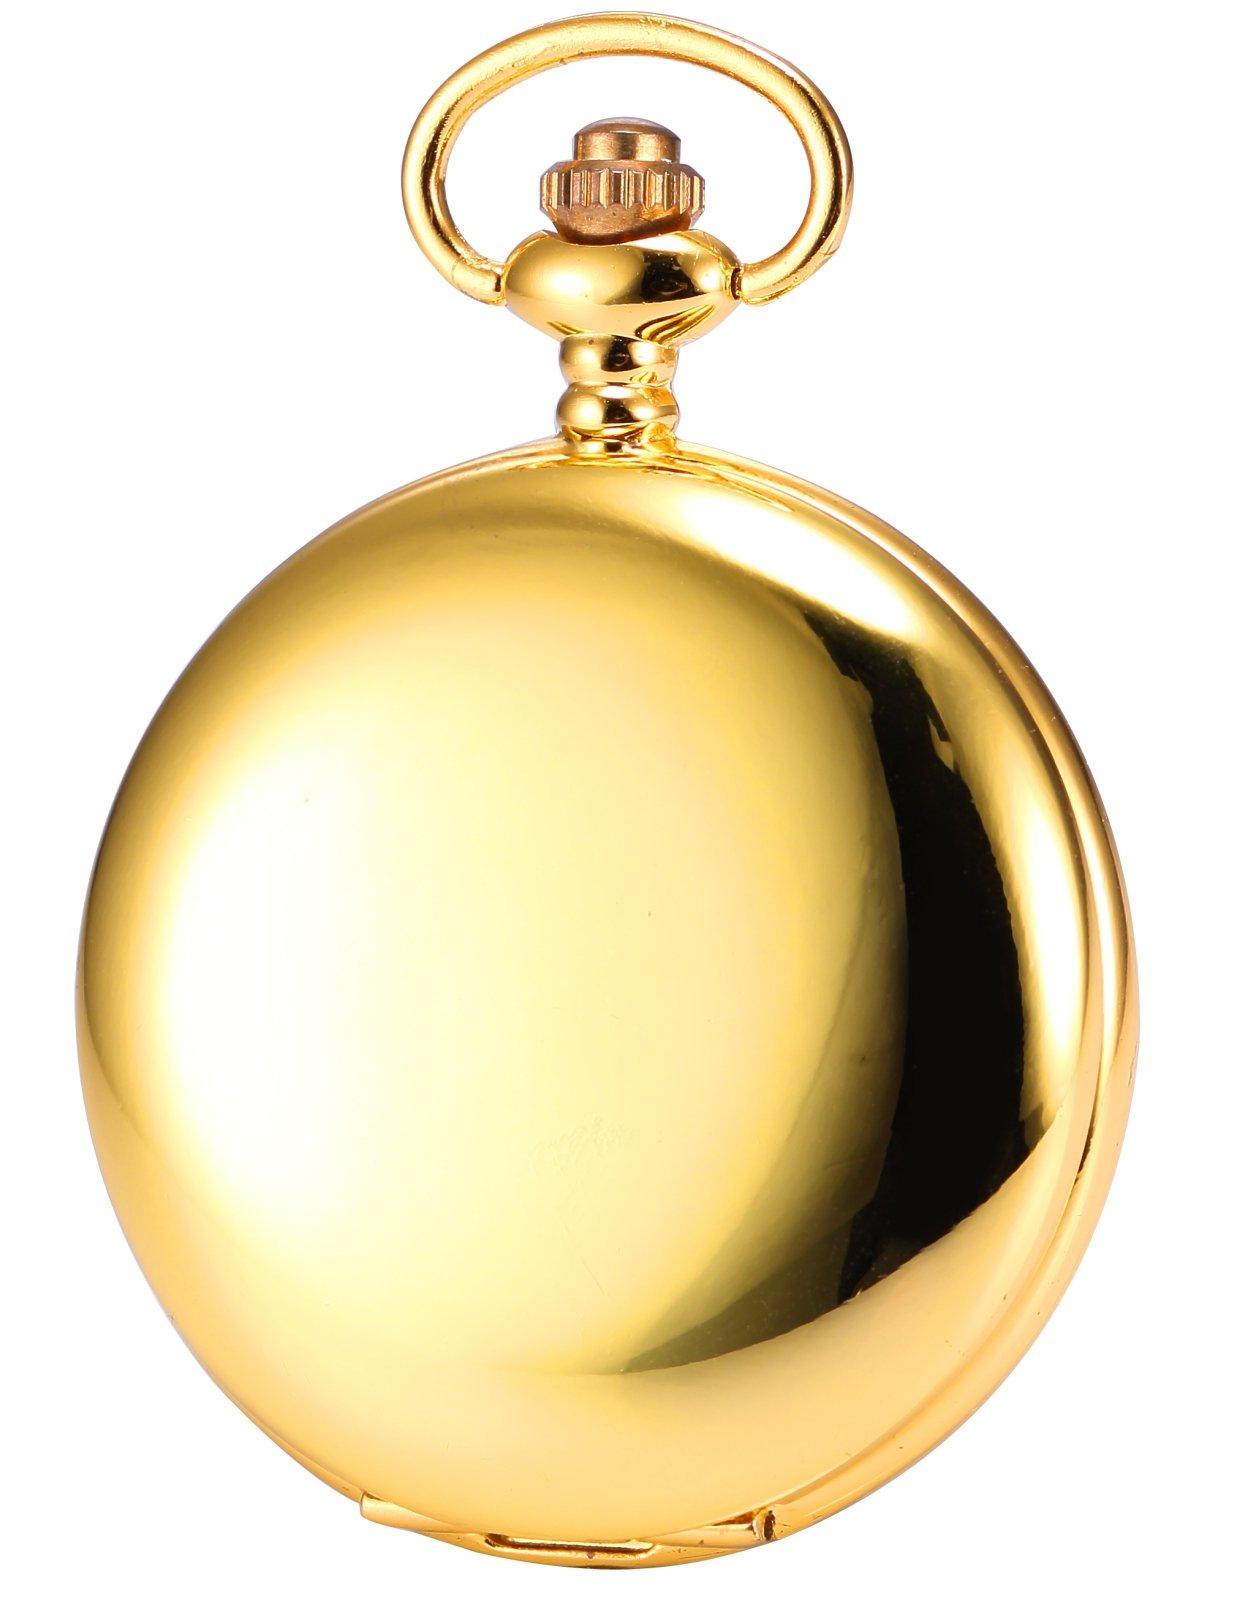 HELMASK pocket watch - Alloy Gold Round man mens Analog quartz Pocket Watch